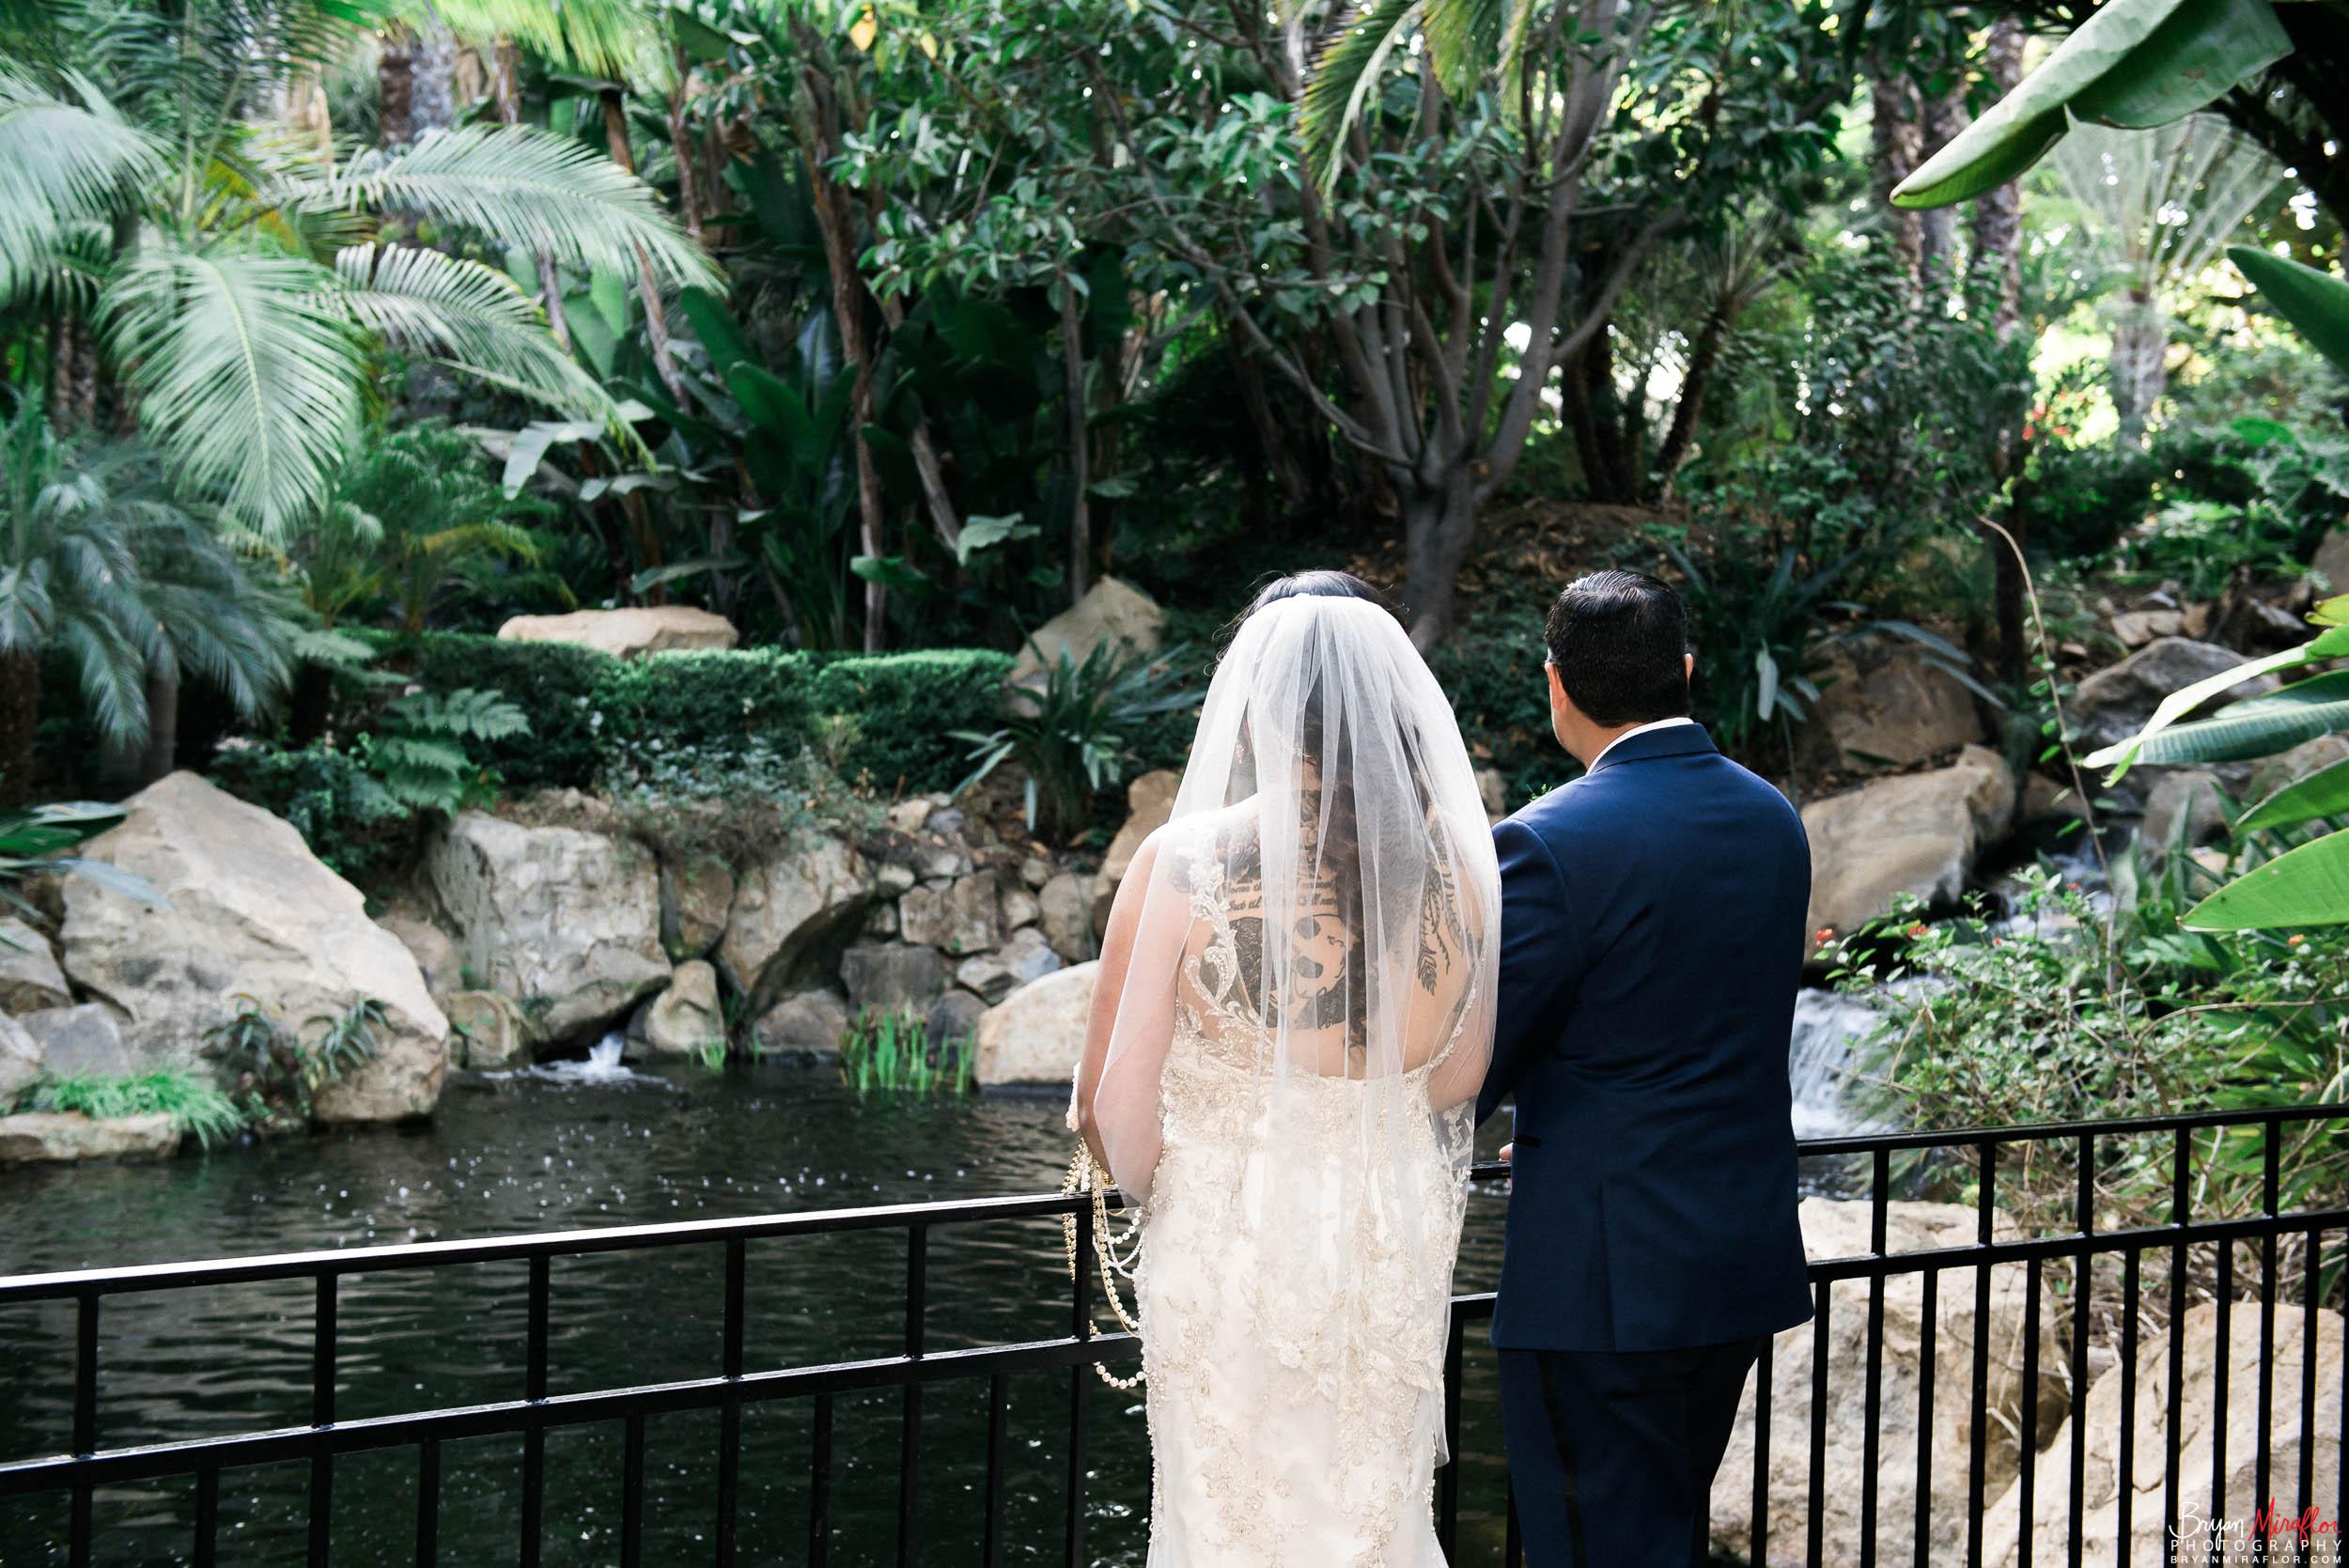 Bryan-Miraflor-Photography-Hannah-Jonathan-Married-Grand-Traditions-Estate-Gardens-Fallbrook-20171222-001.jpg